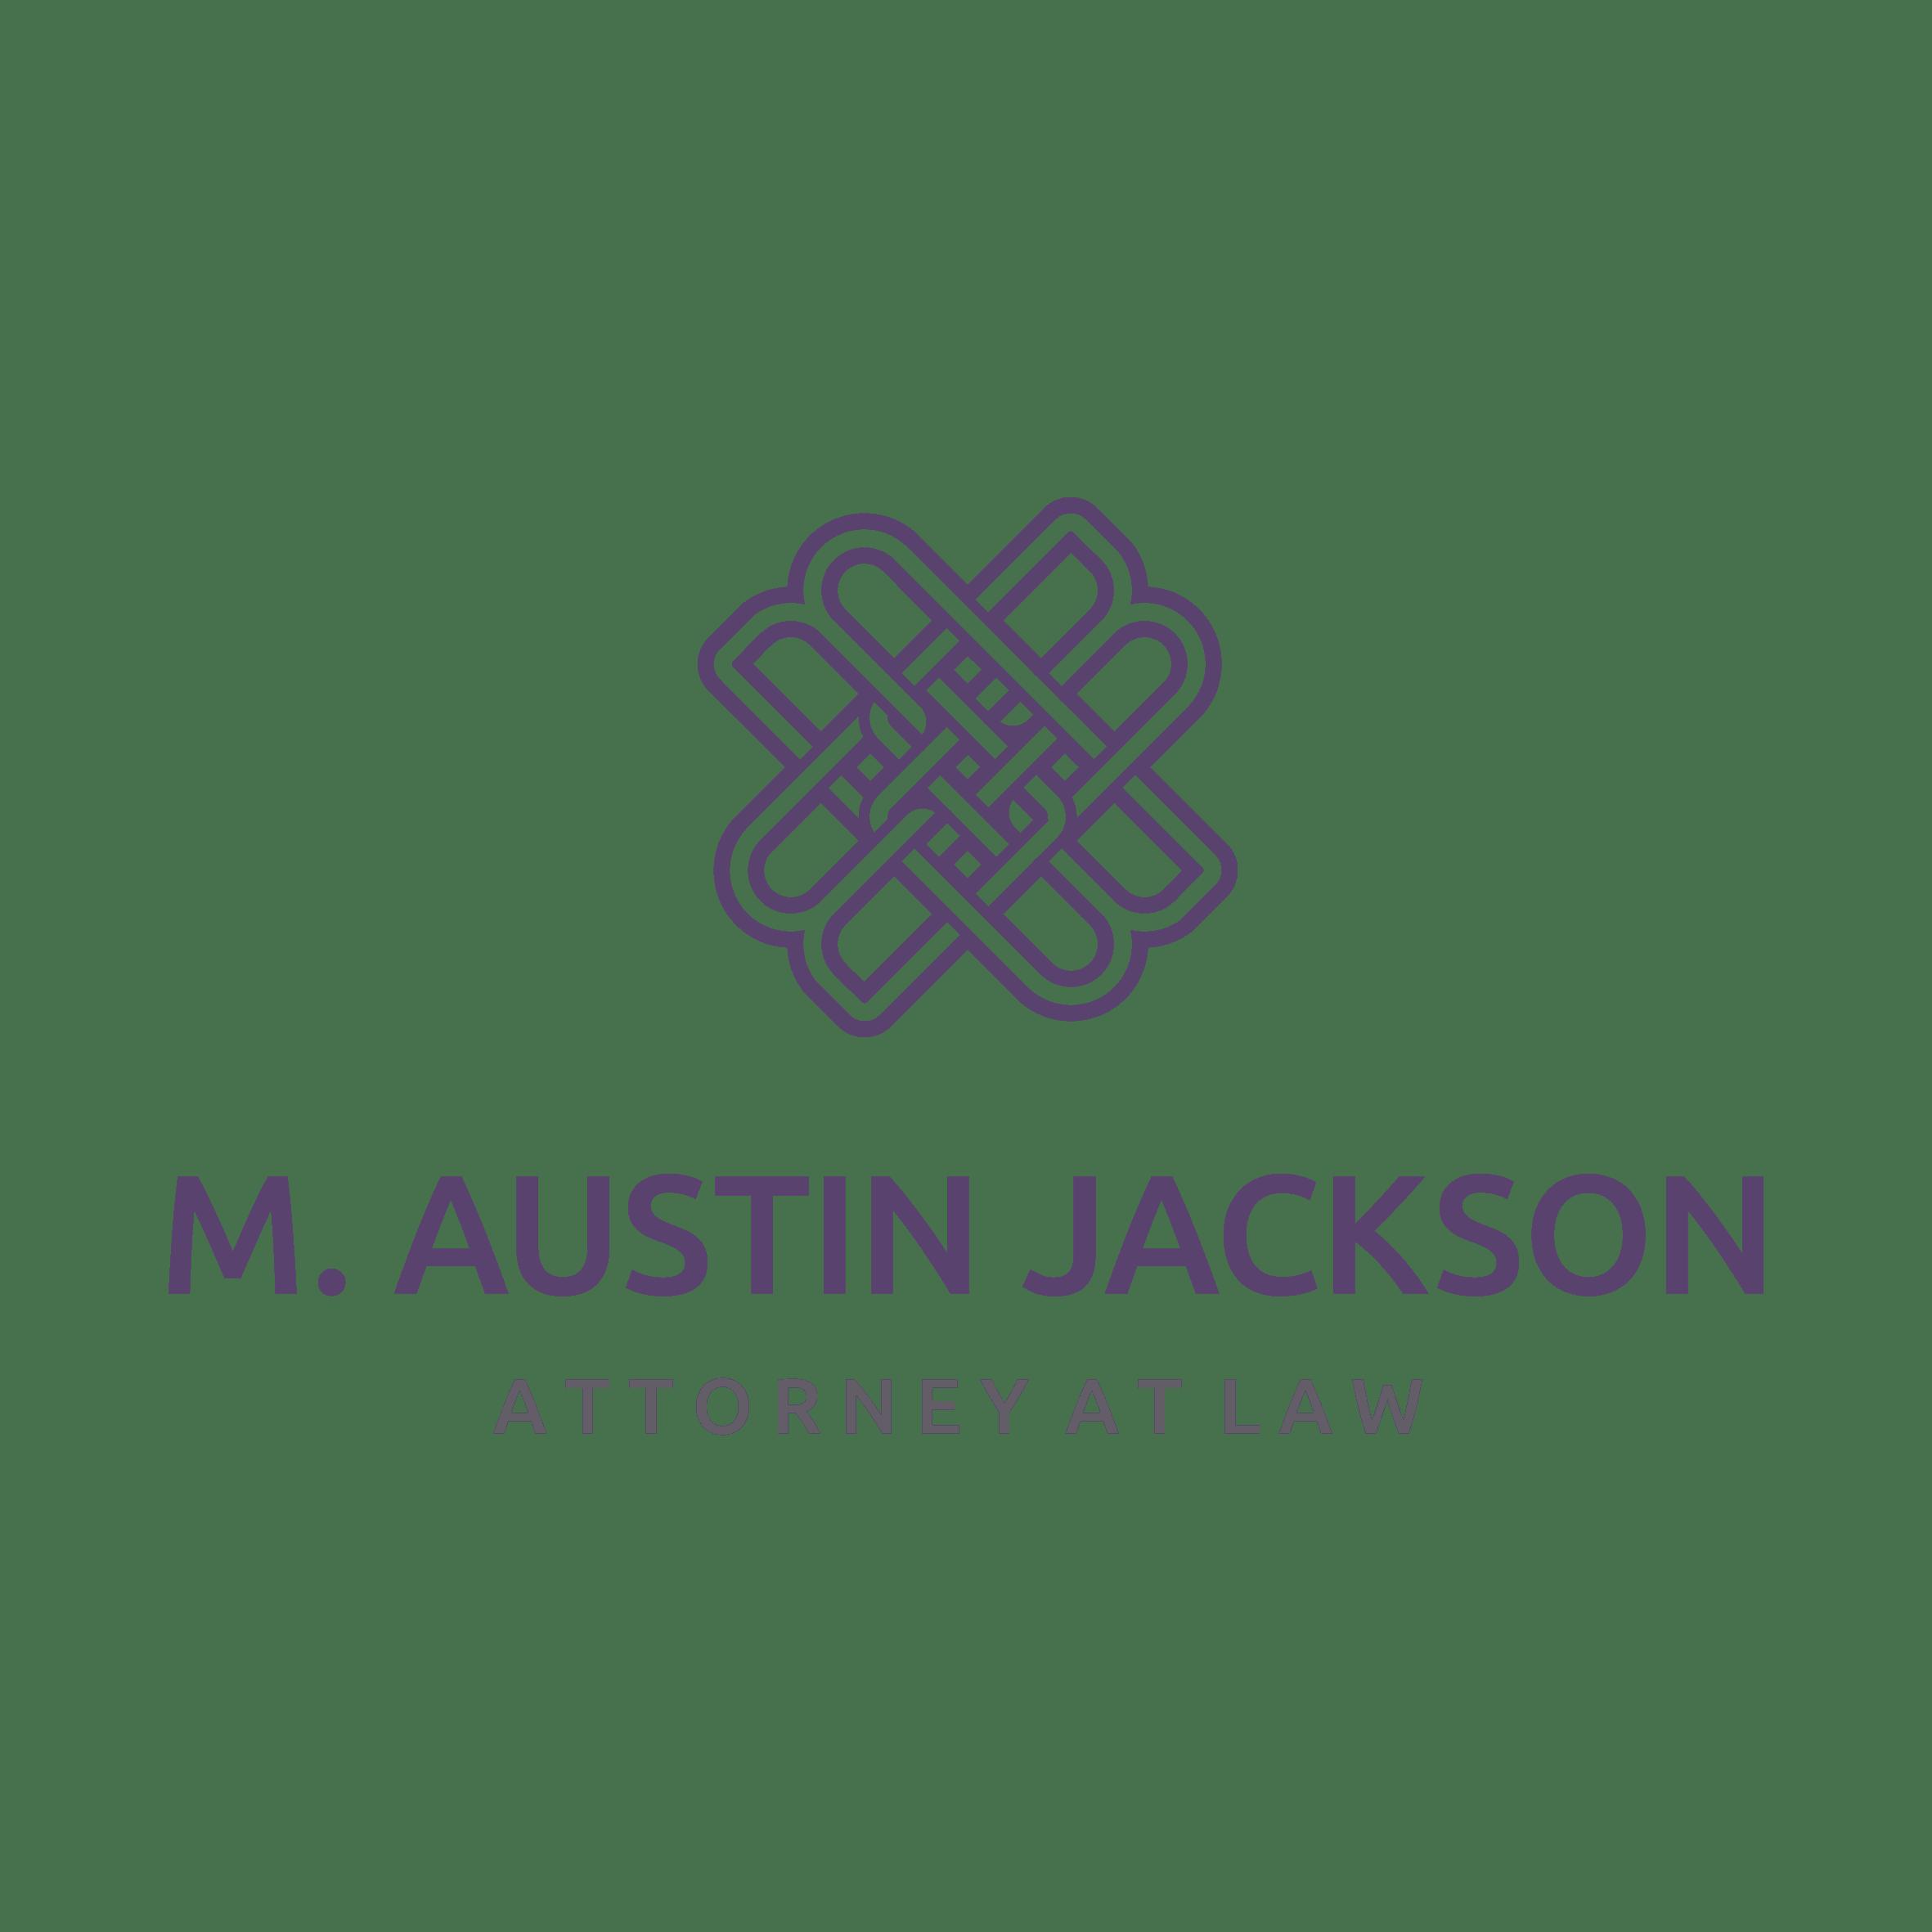 M. Austin Jackson Attorney at Law